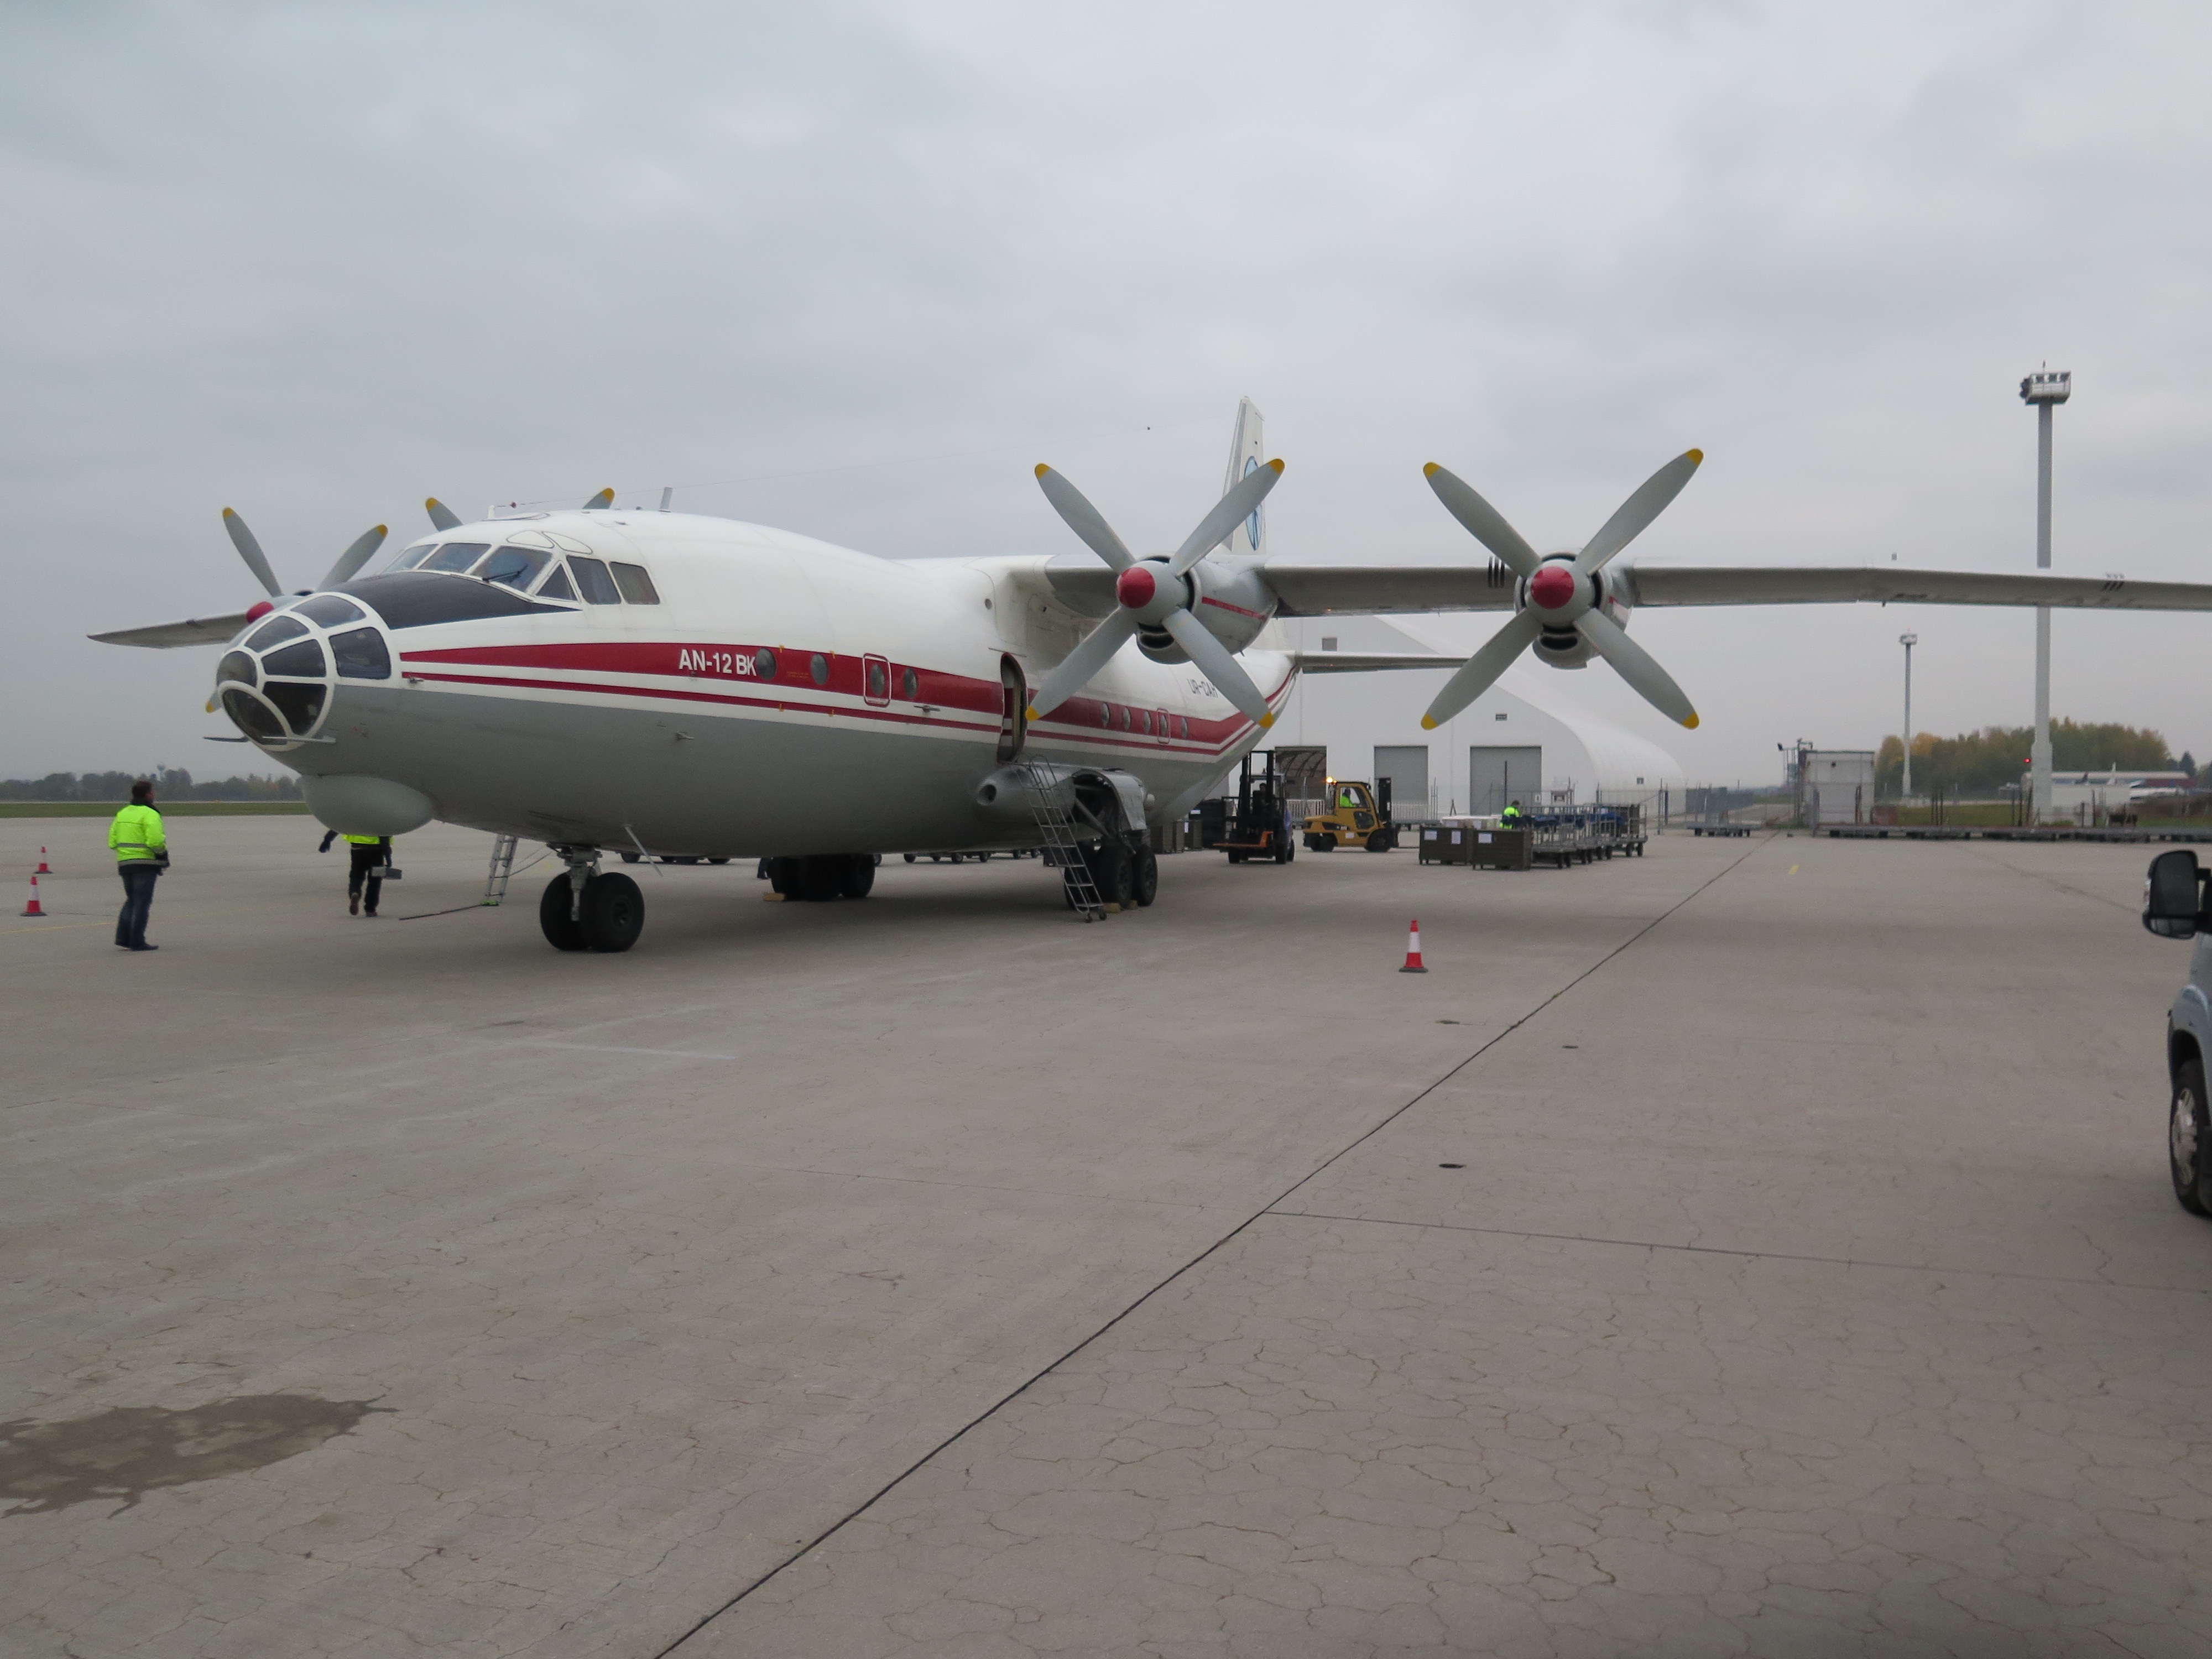 Letecká přeprava / Air Transport